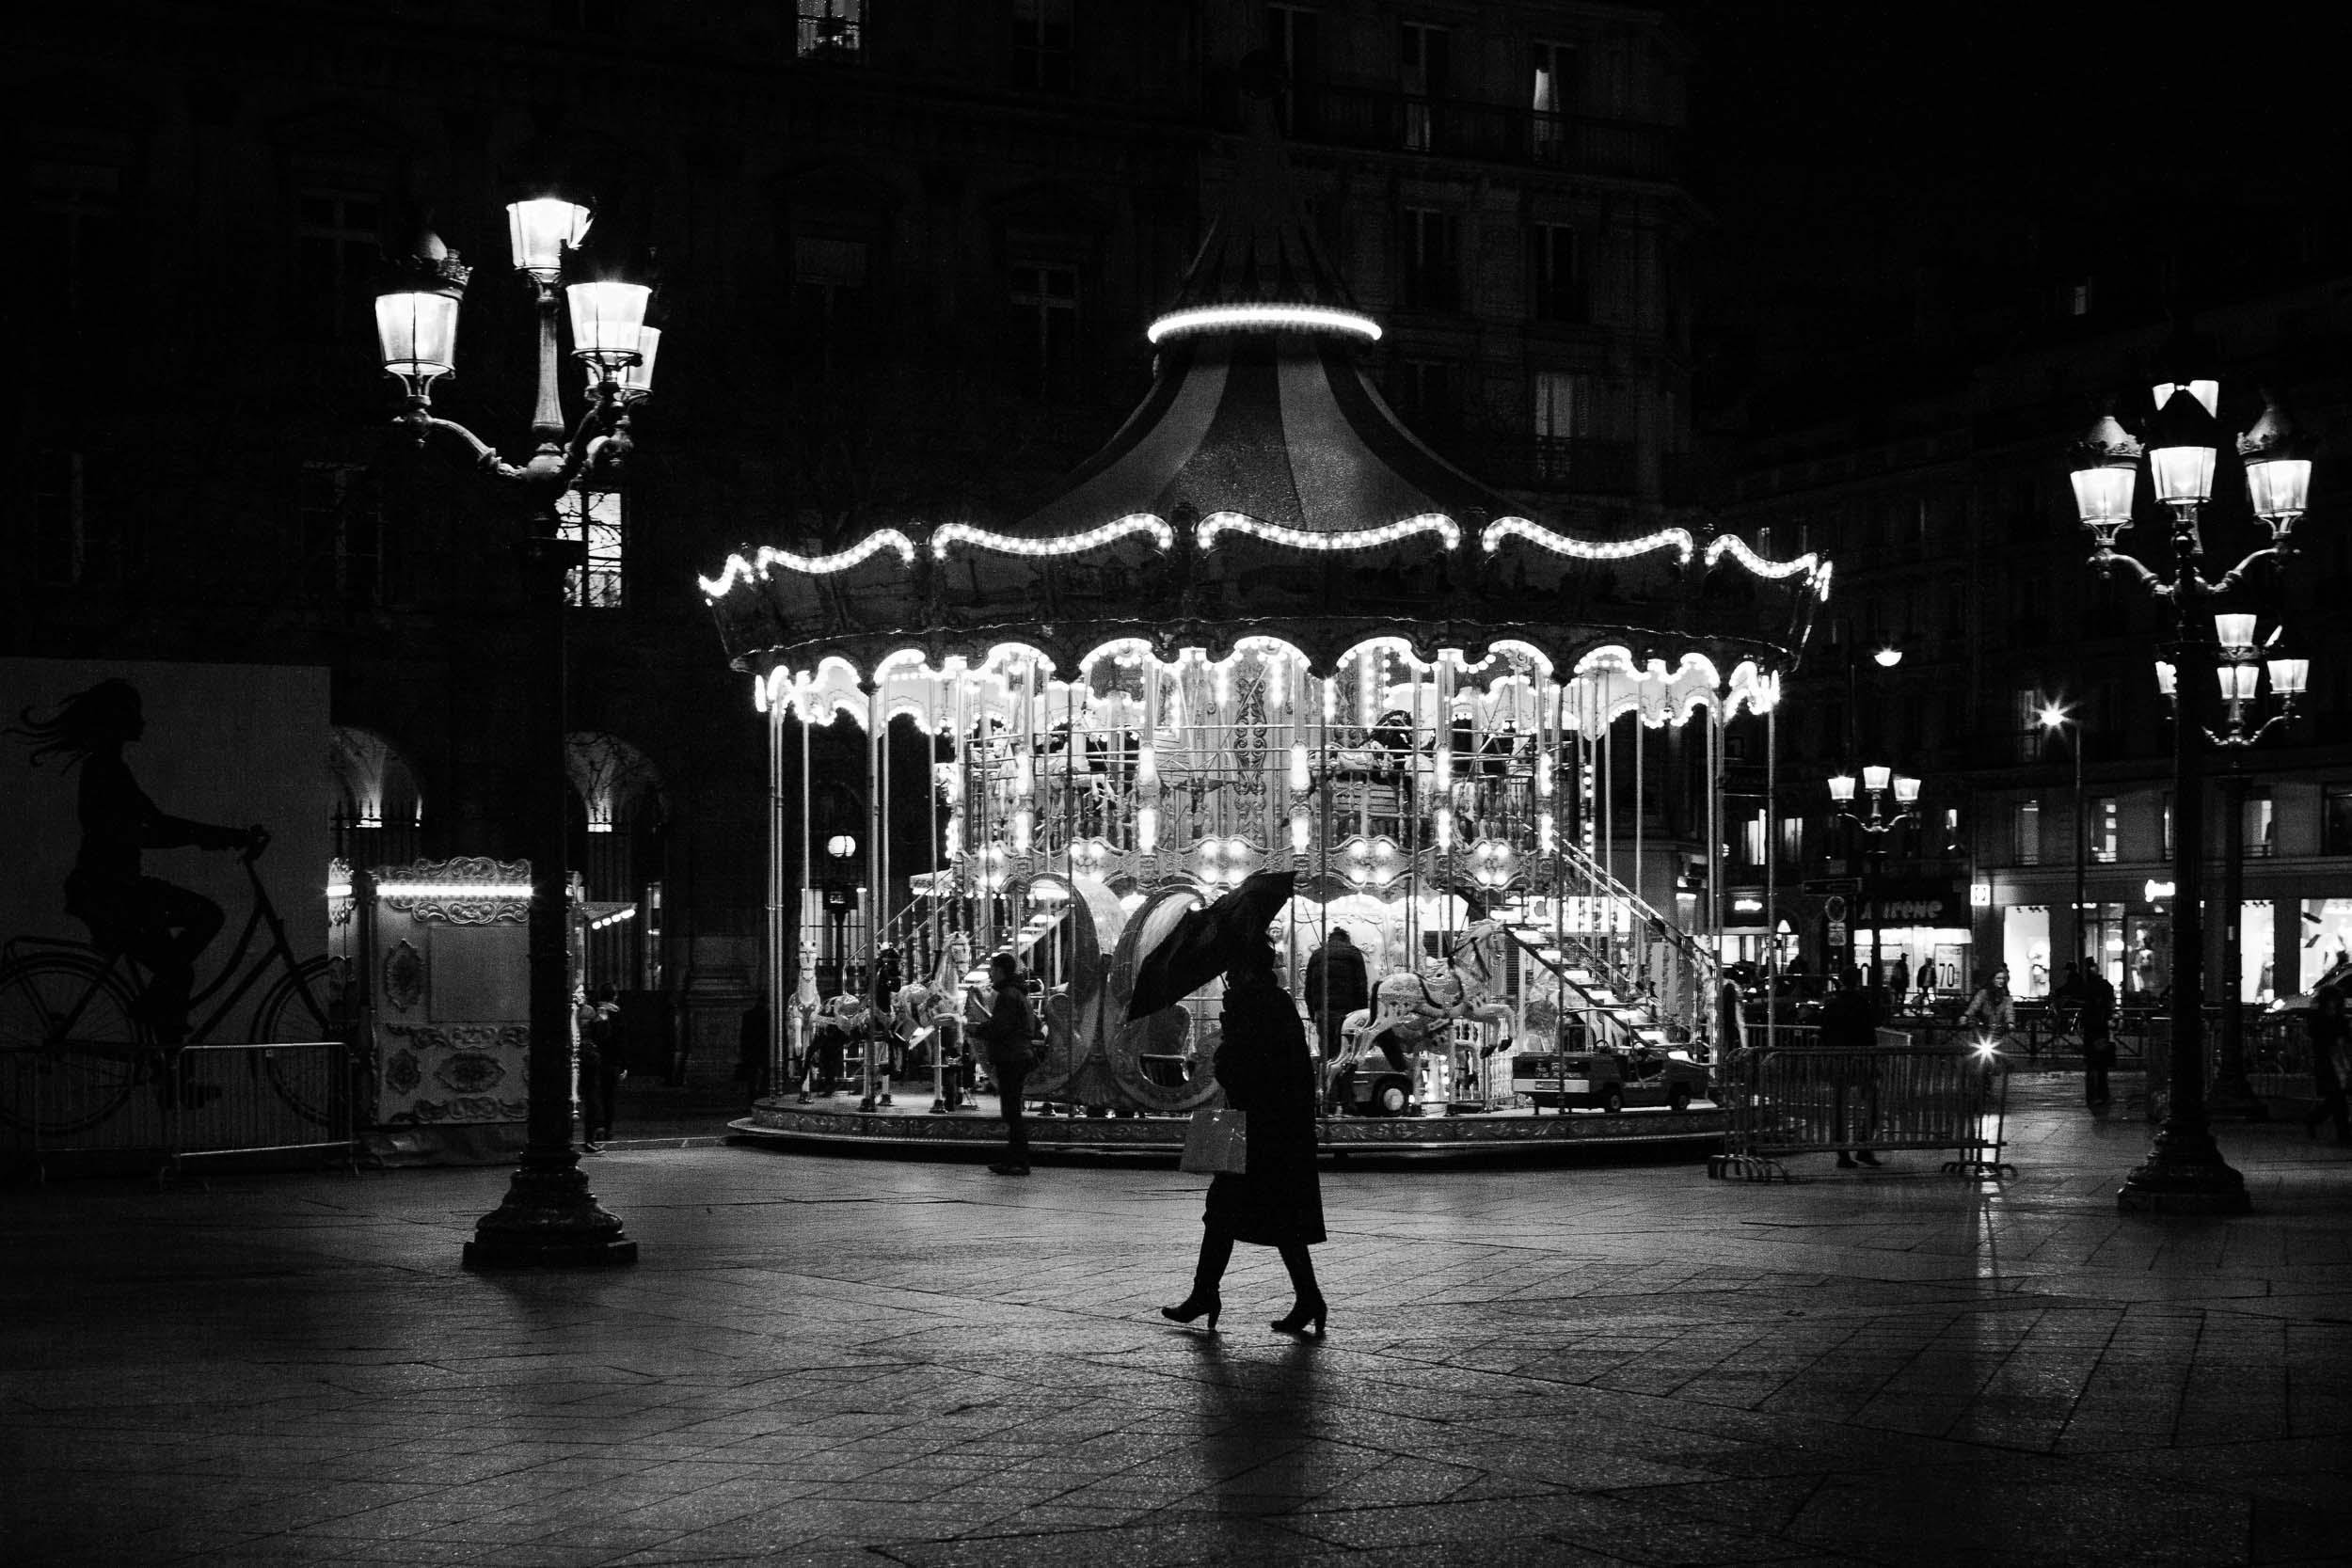 Paris-woman-walking-with-umbrella-front-of-carousel.jpg